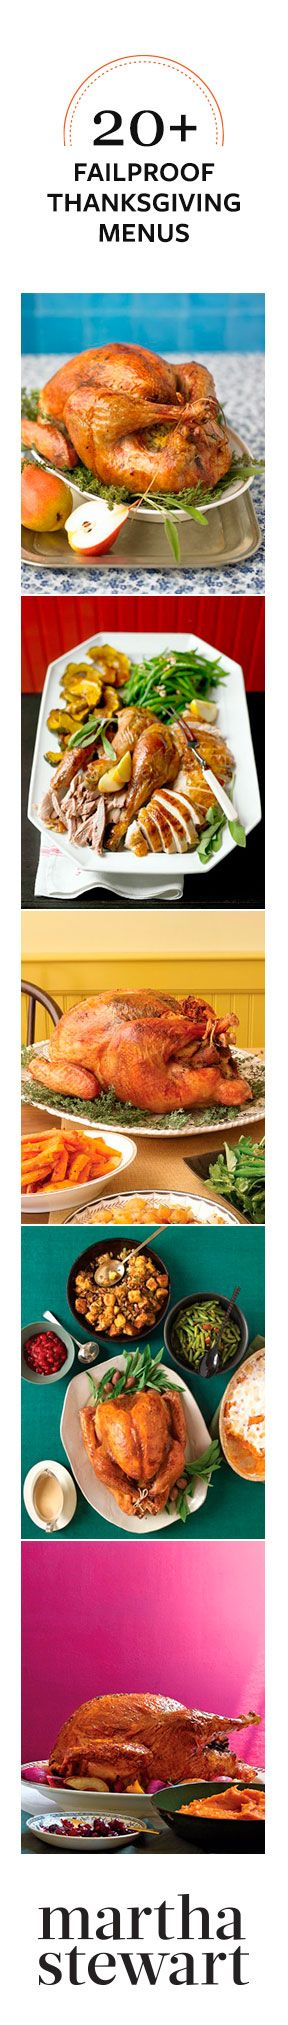 20+ Failproof Thanksgiving Menus from Martha Stewart